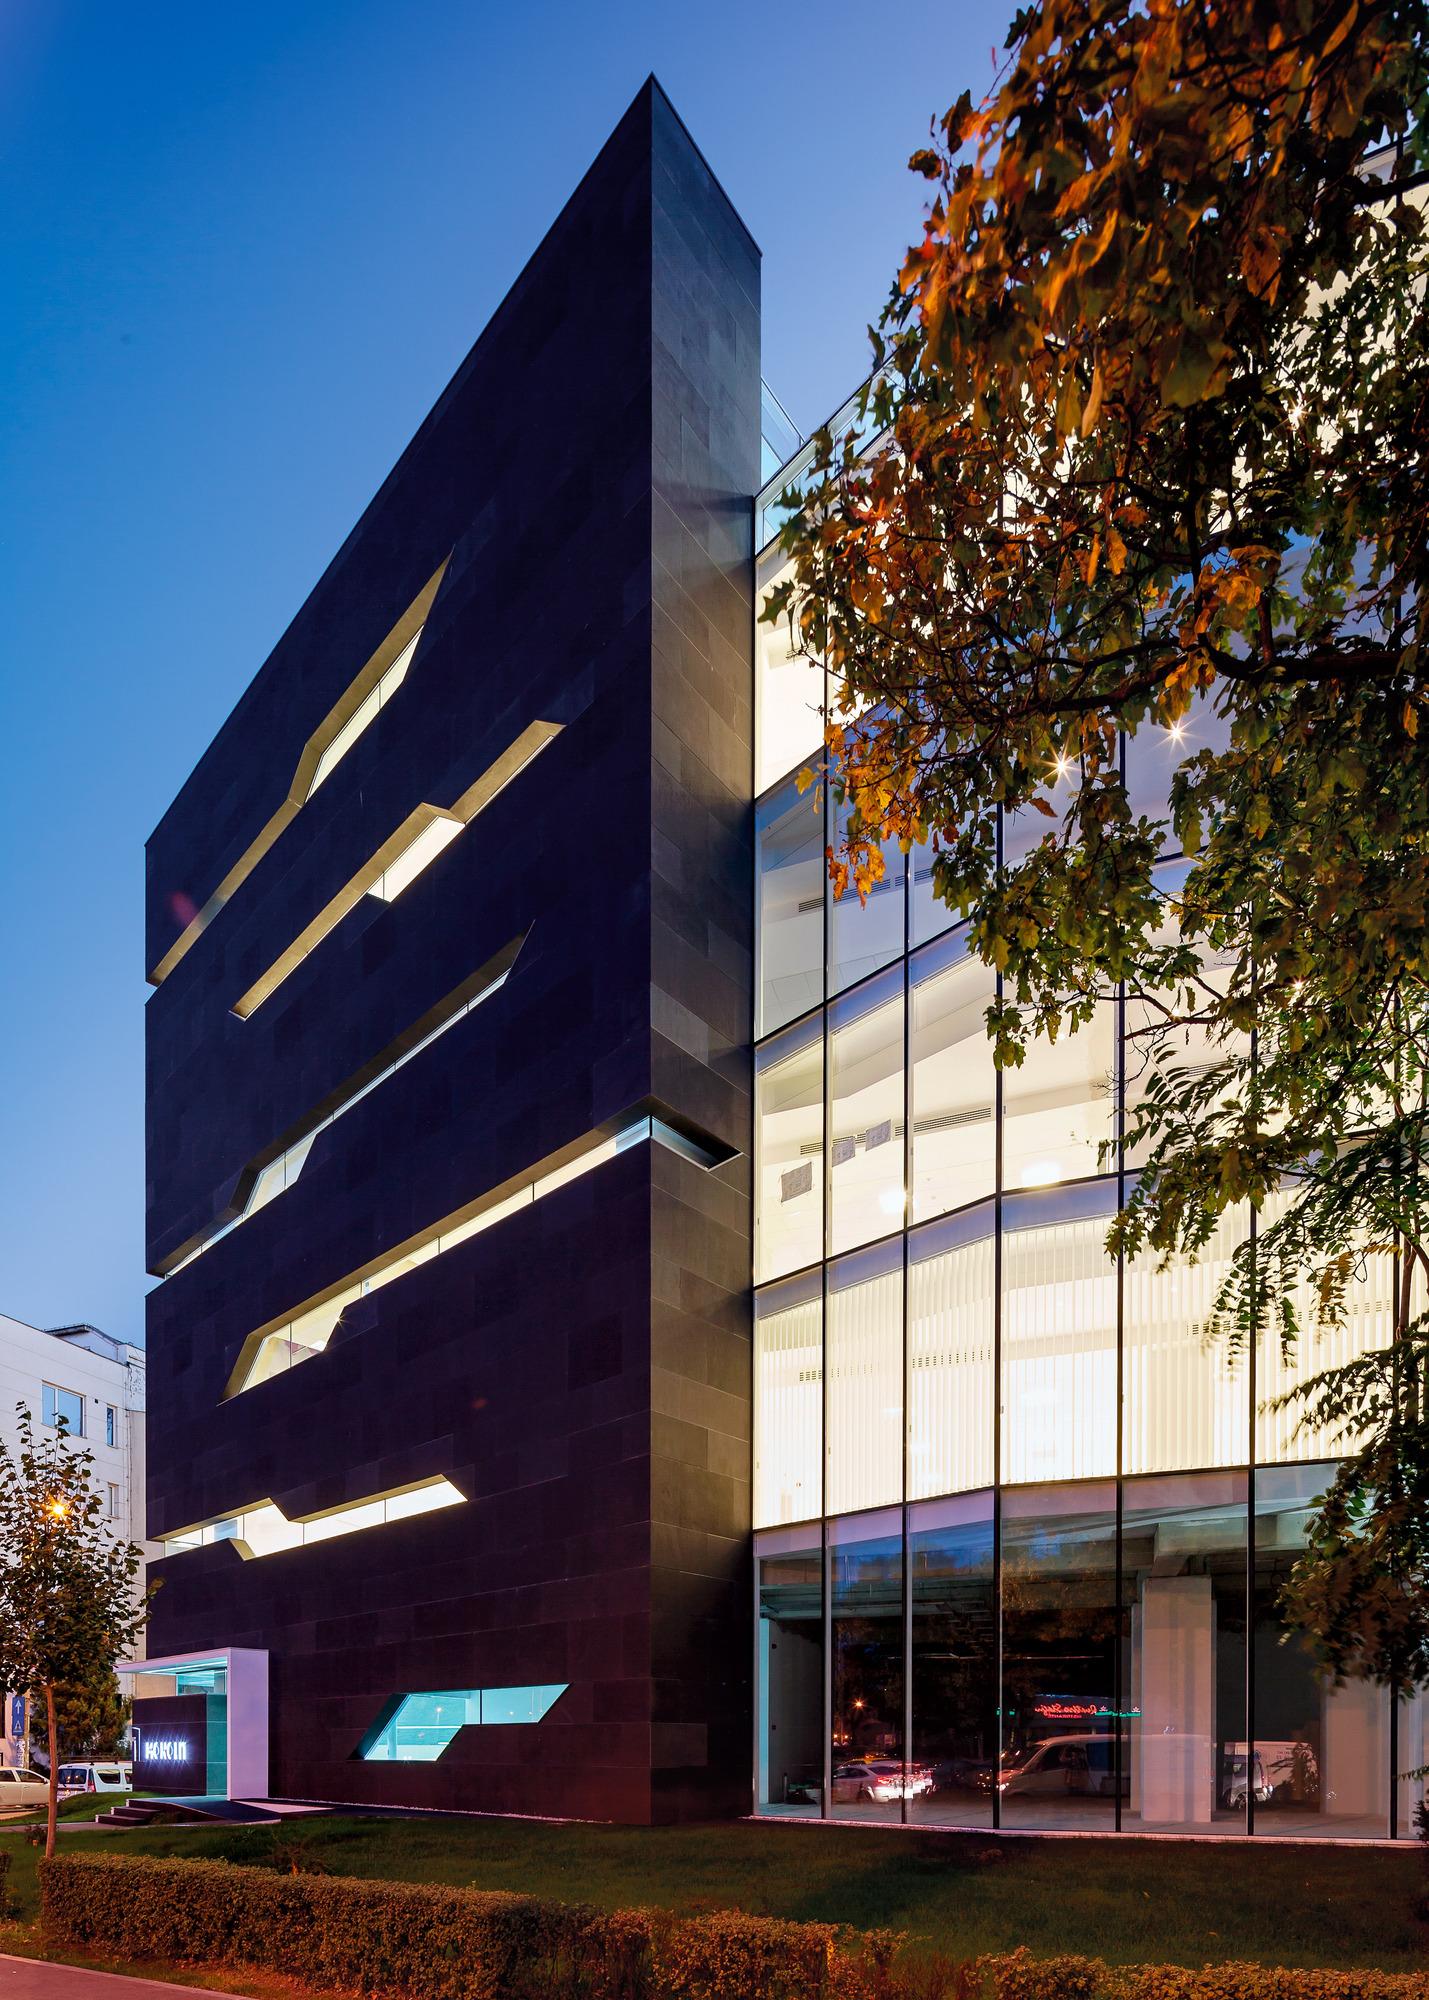 5111d4deb3fc4b4135000024_monolit-office-building-igloo-architecture_cdragomir_monolit_018